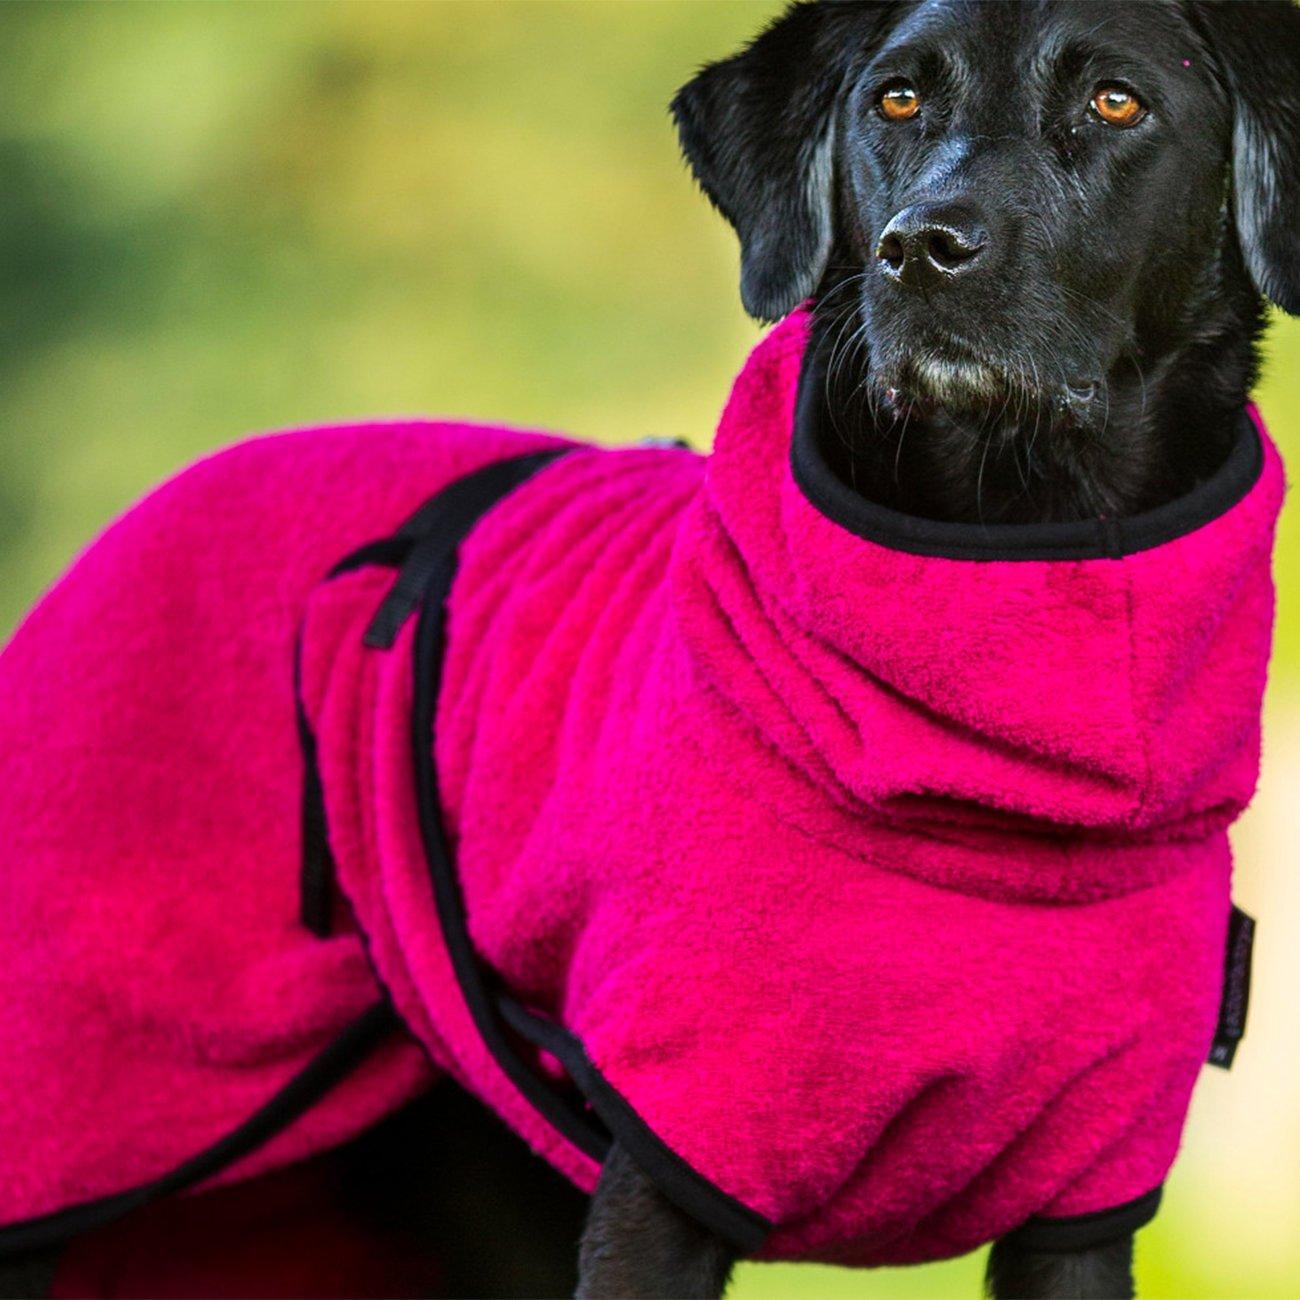 fit4dogs Trockenmantel Hund Dryup Cape, Bild 21